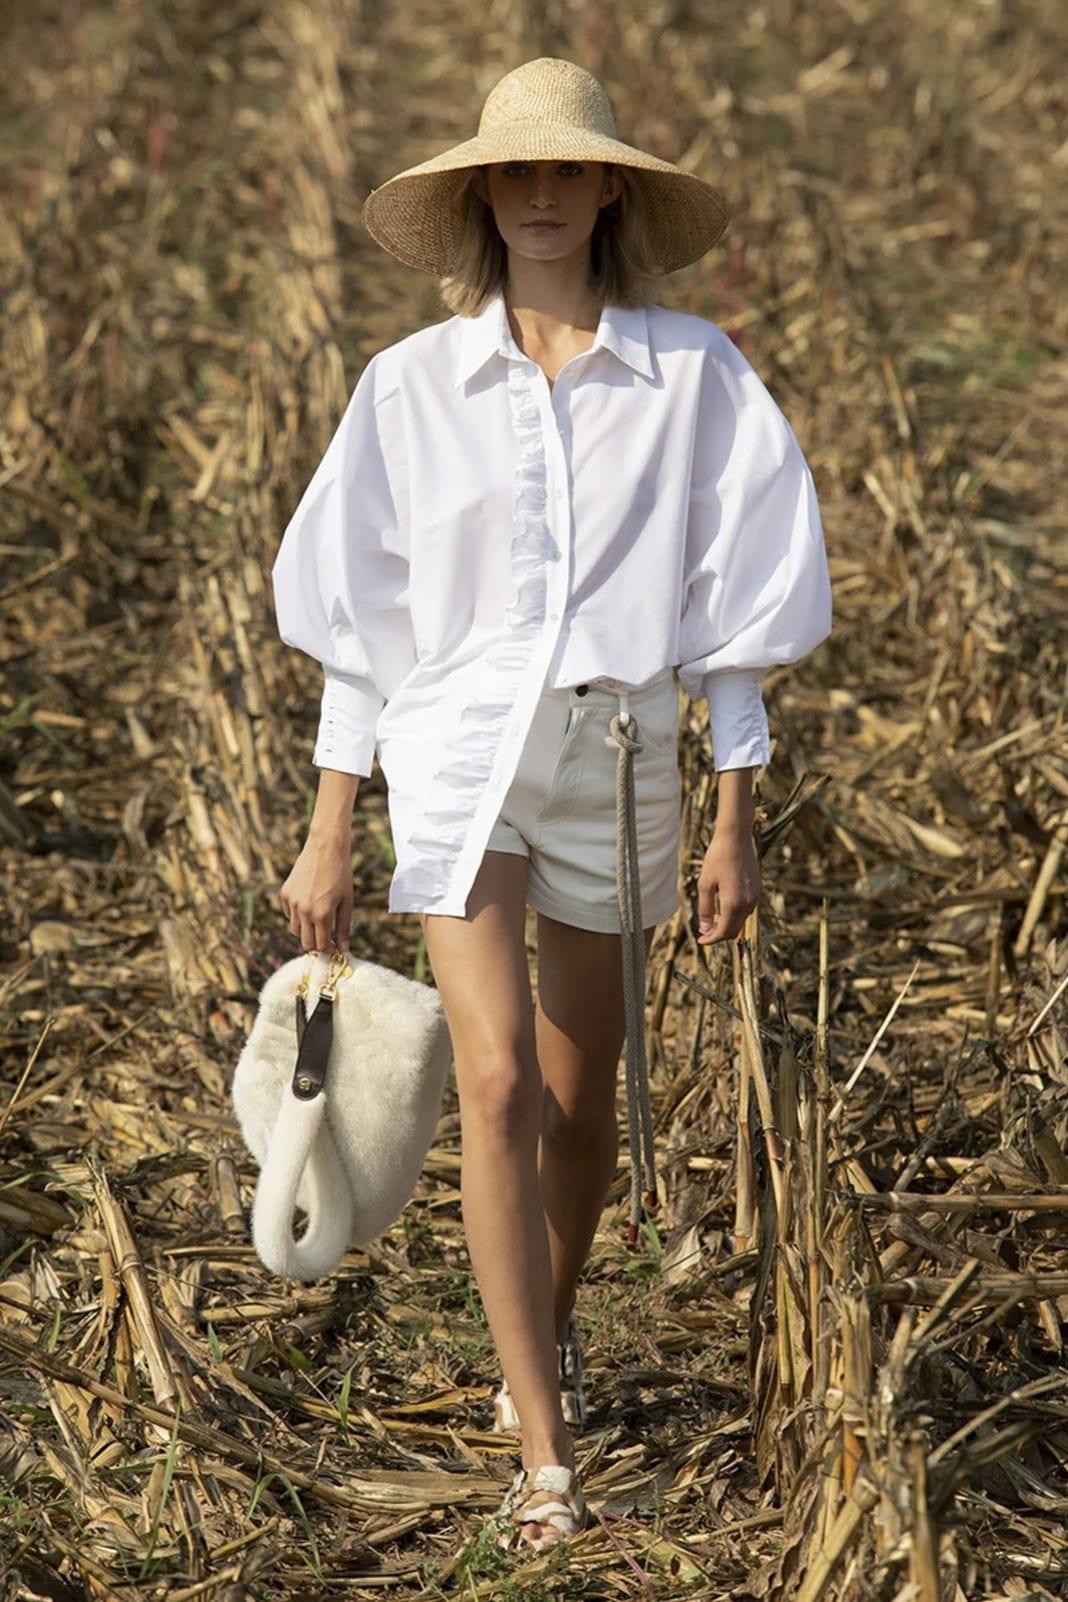 Bold shoulders Πώς φόρεσε την απόλυτη τάση της σεζόν η Olivia Culpo